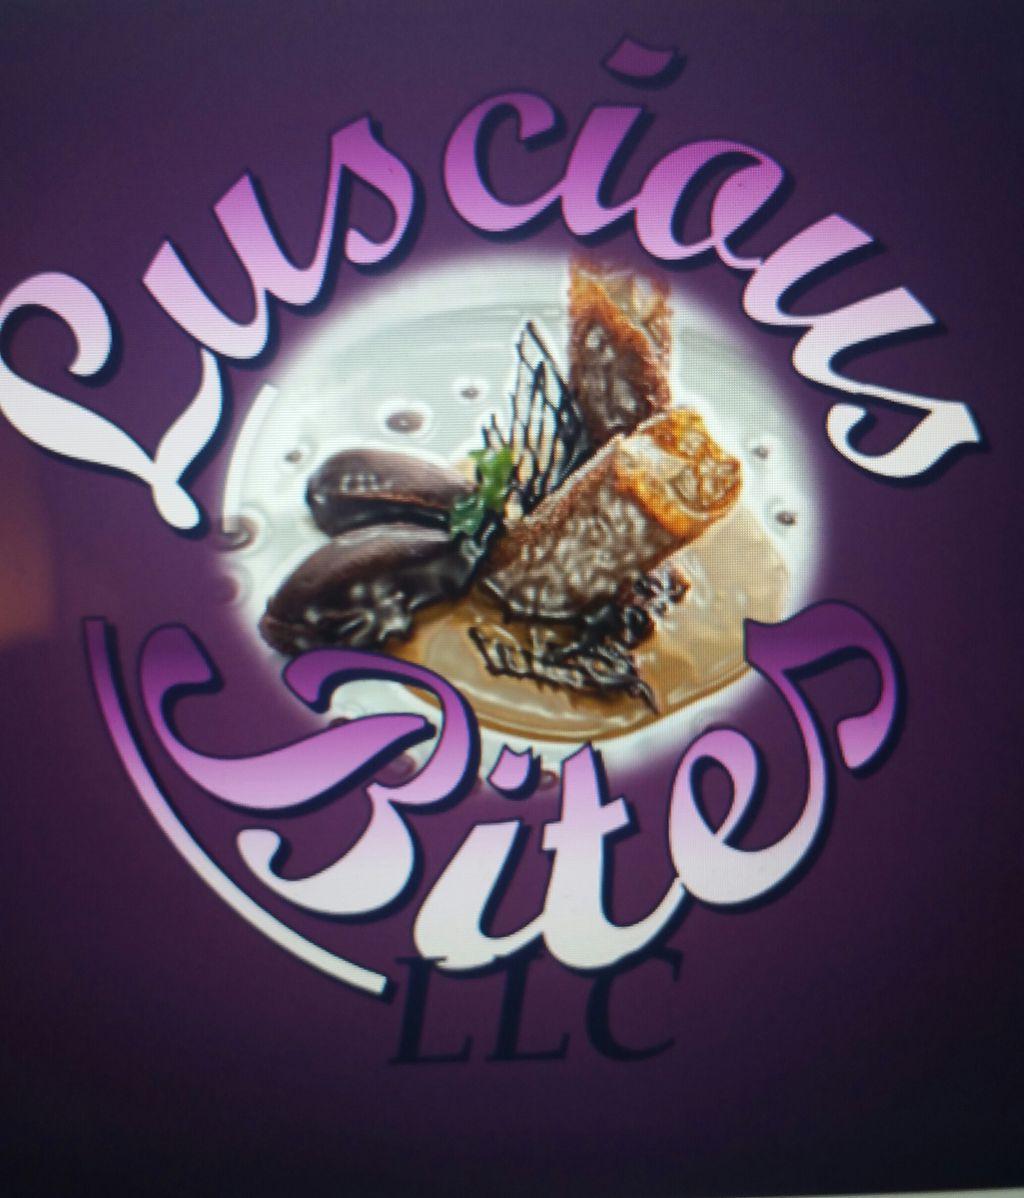 Luscious Bites, LLC